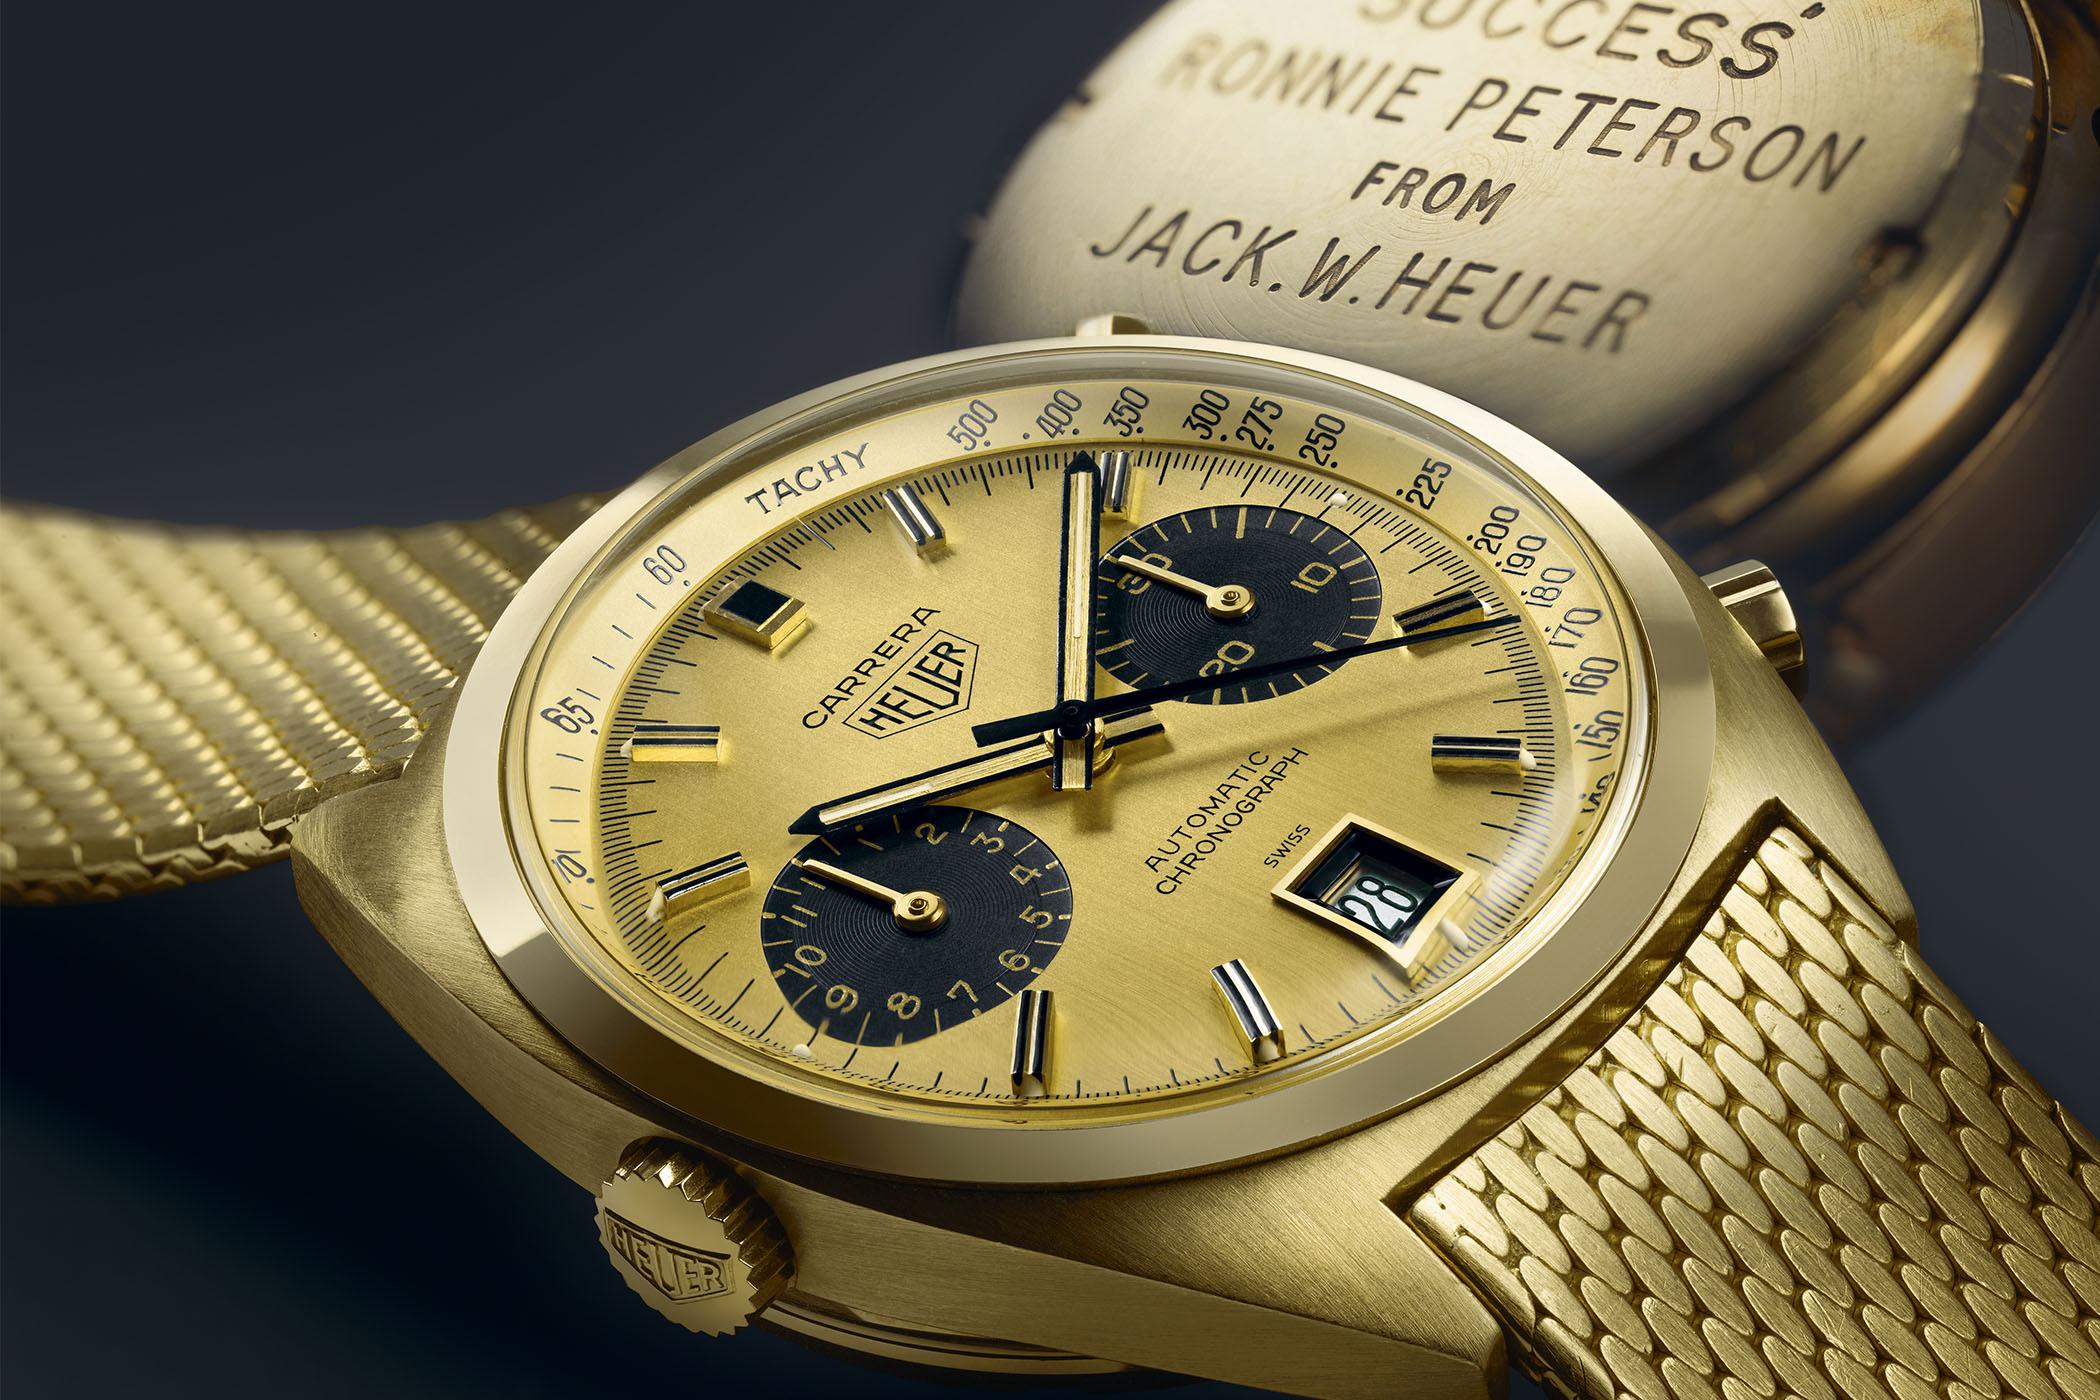 Ronnie Peterson orginal gold heuer carrera 1158 CHN